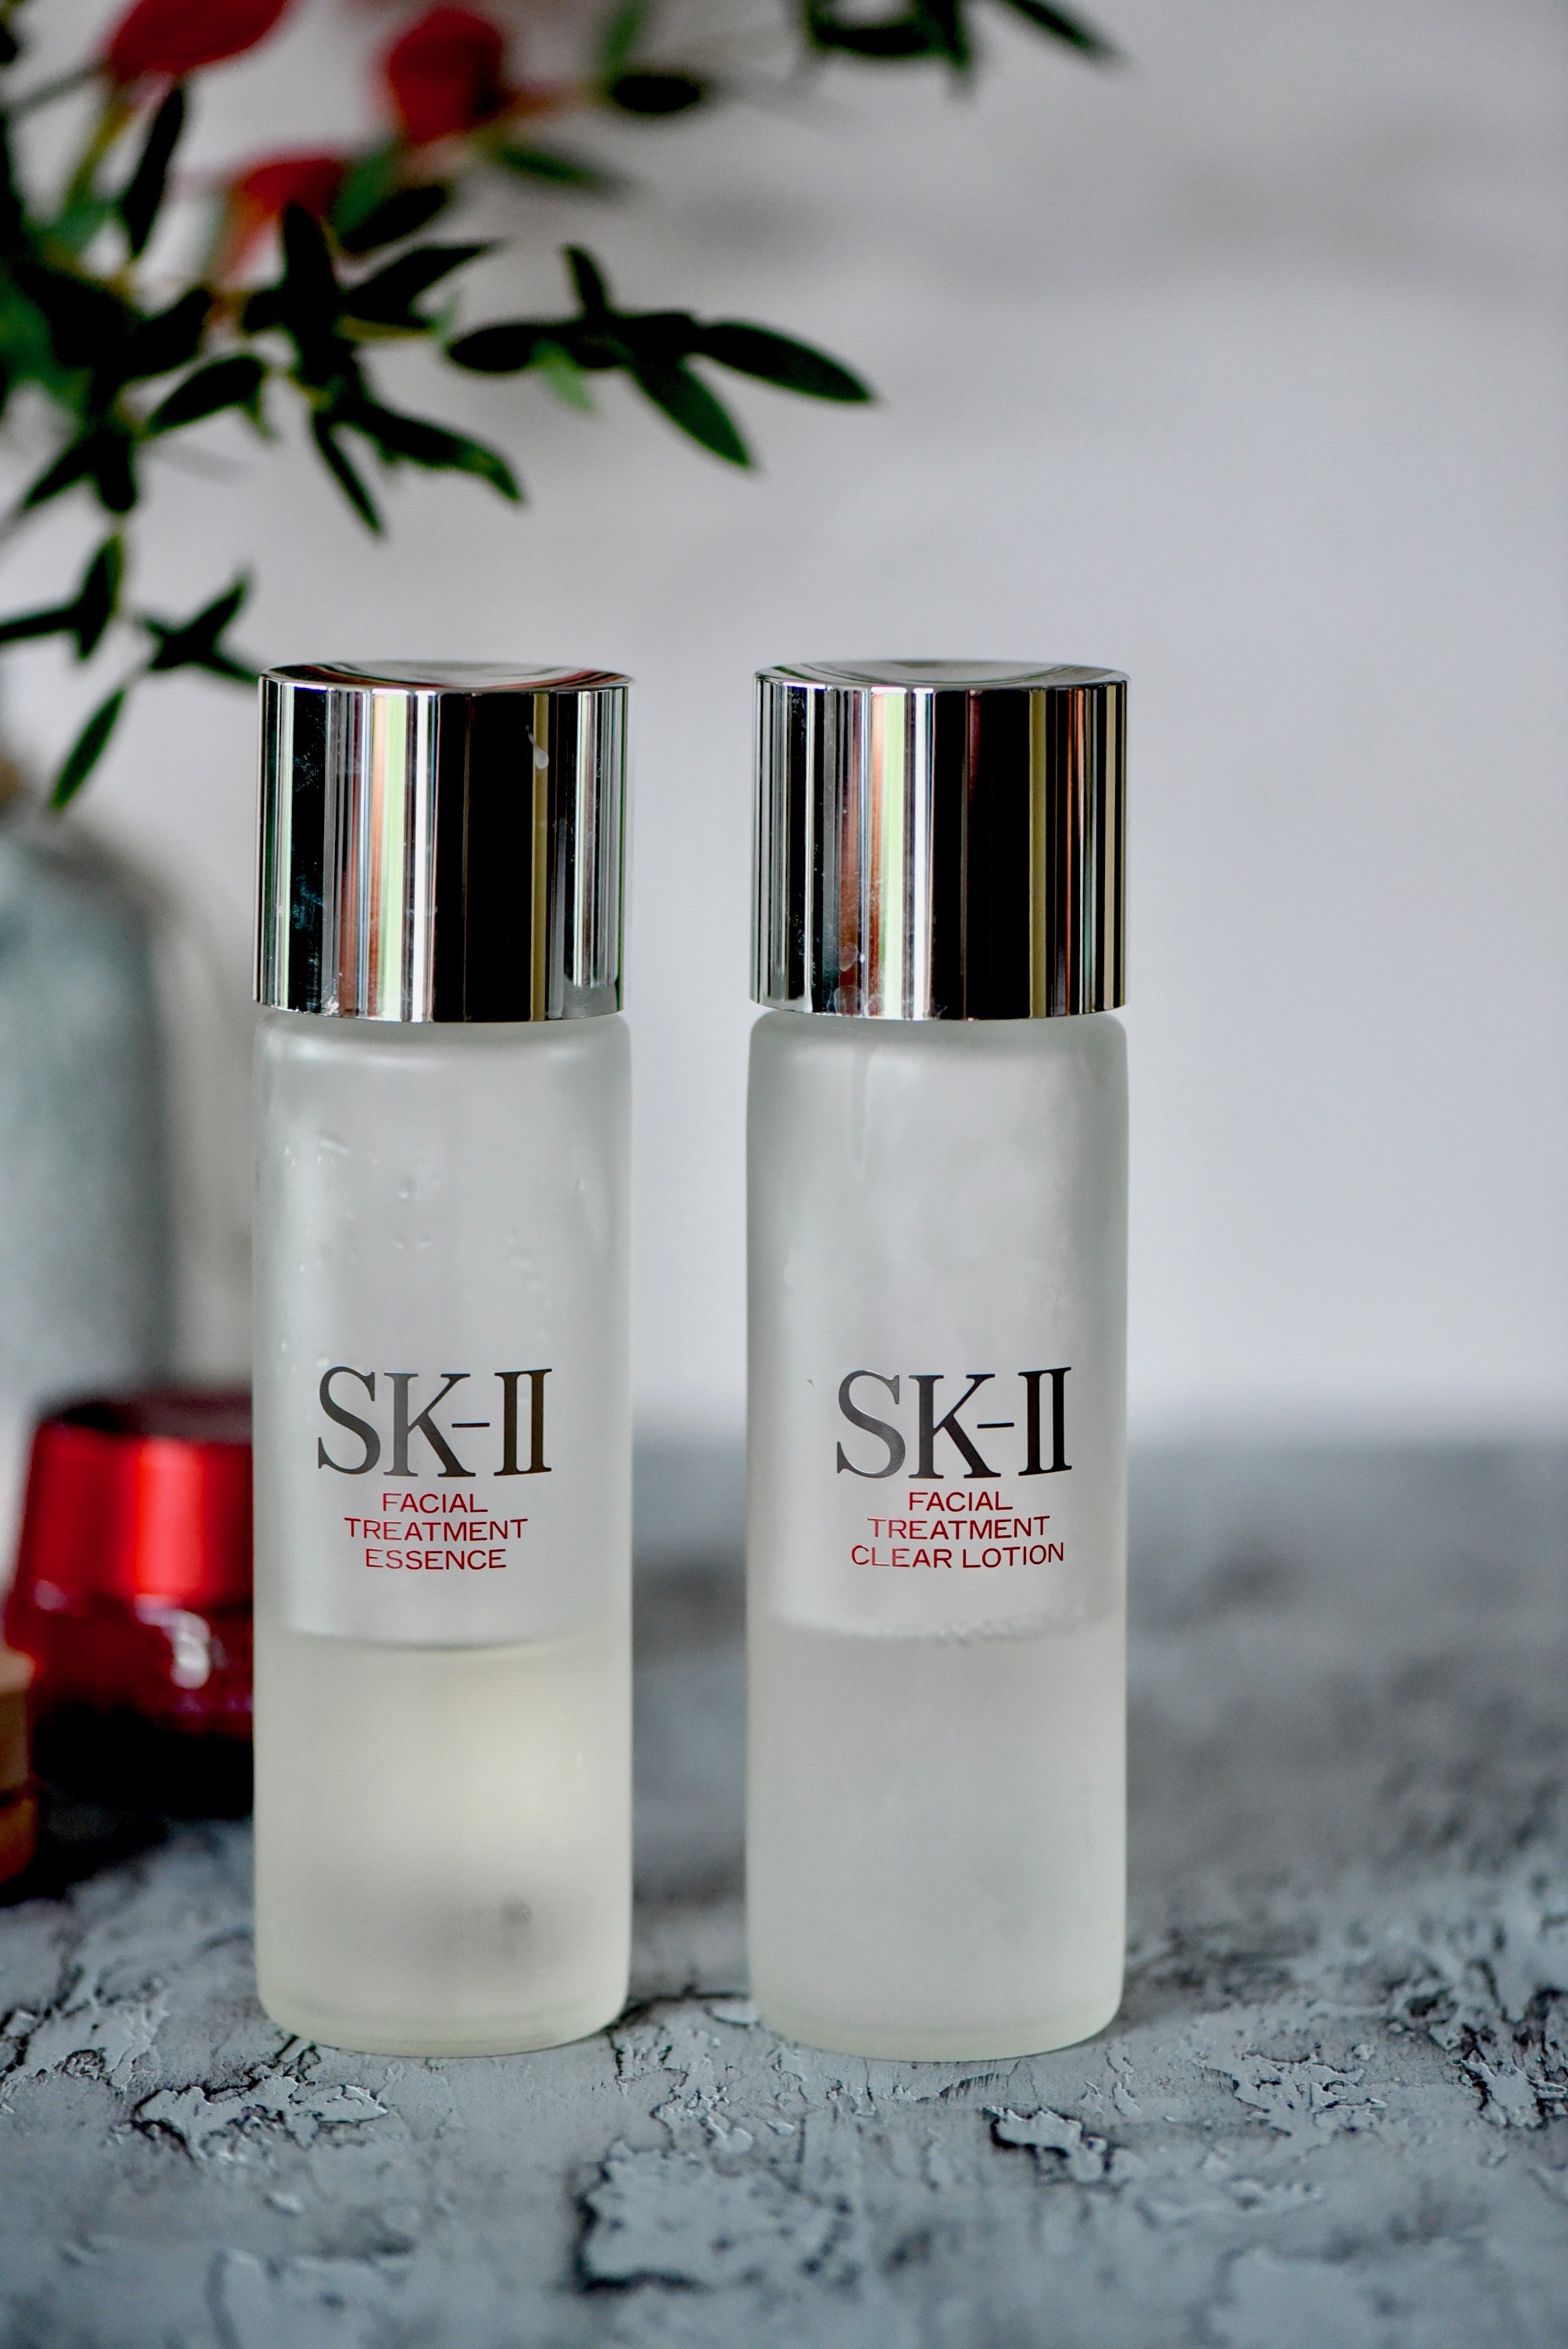 SK-II SKINCARE